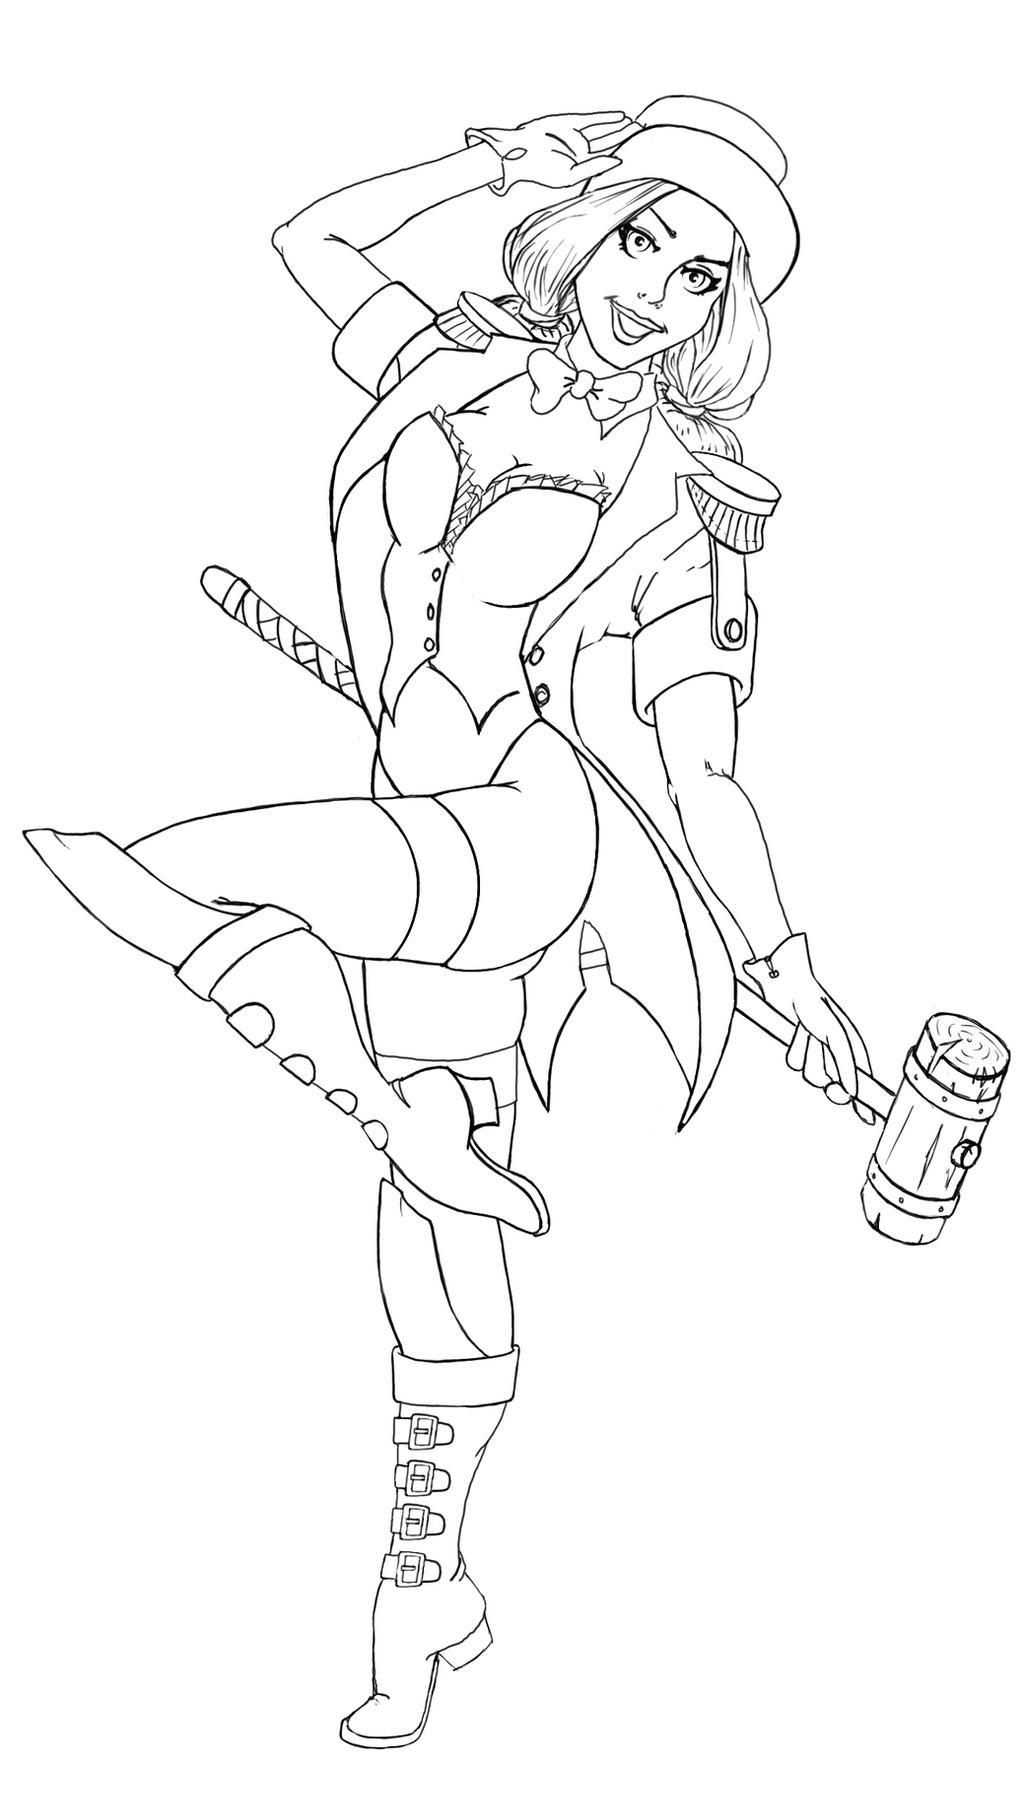 Line Art Harley Quinn : Ringmaster harley quinn line drawing by marker on deviantart